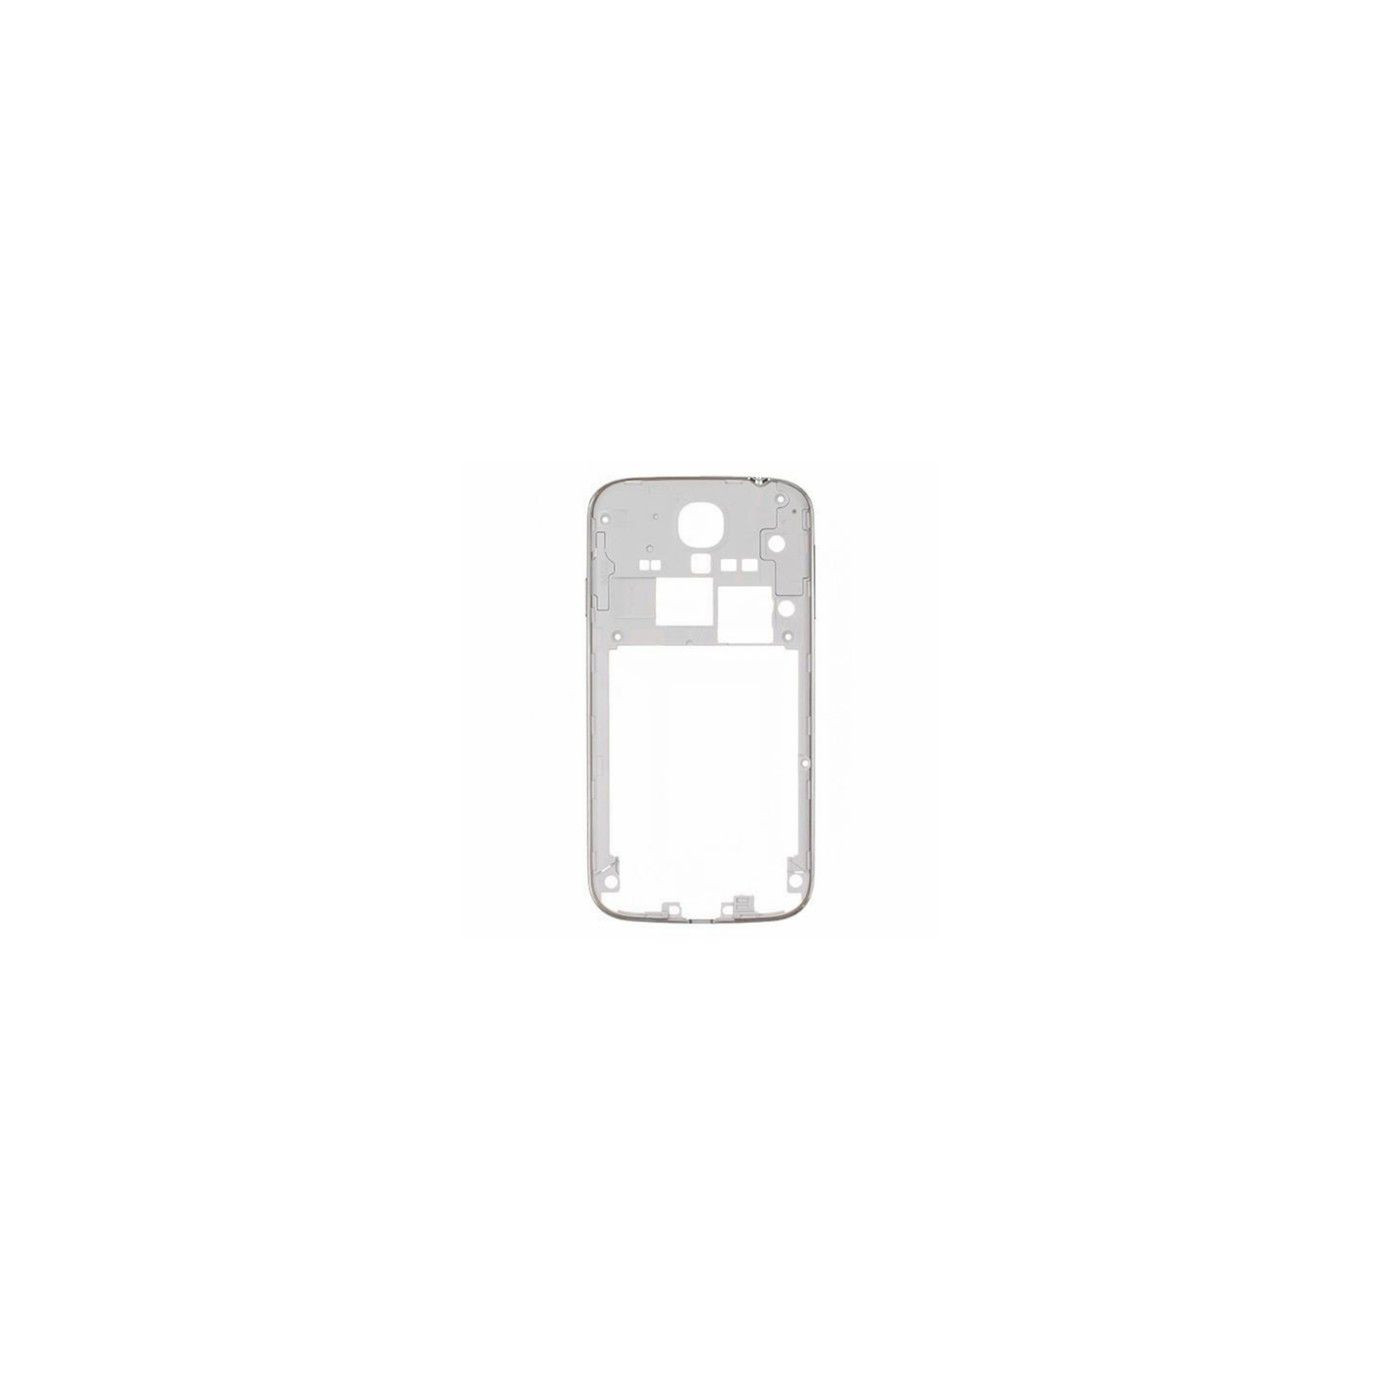 Marco marco trasero marco blanco samsung i9505 s4 borde plateado